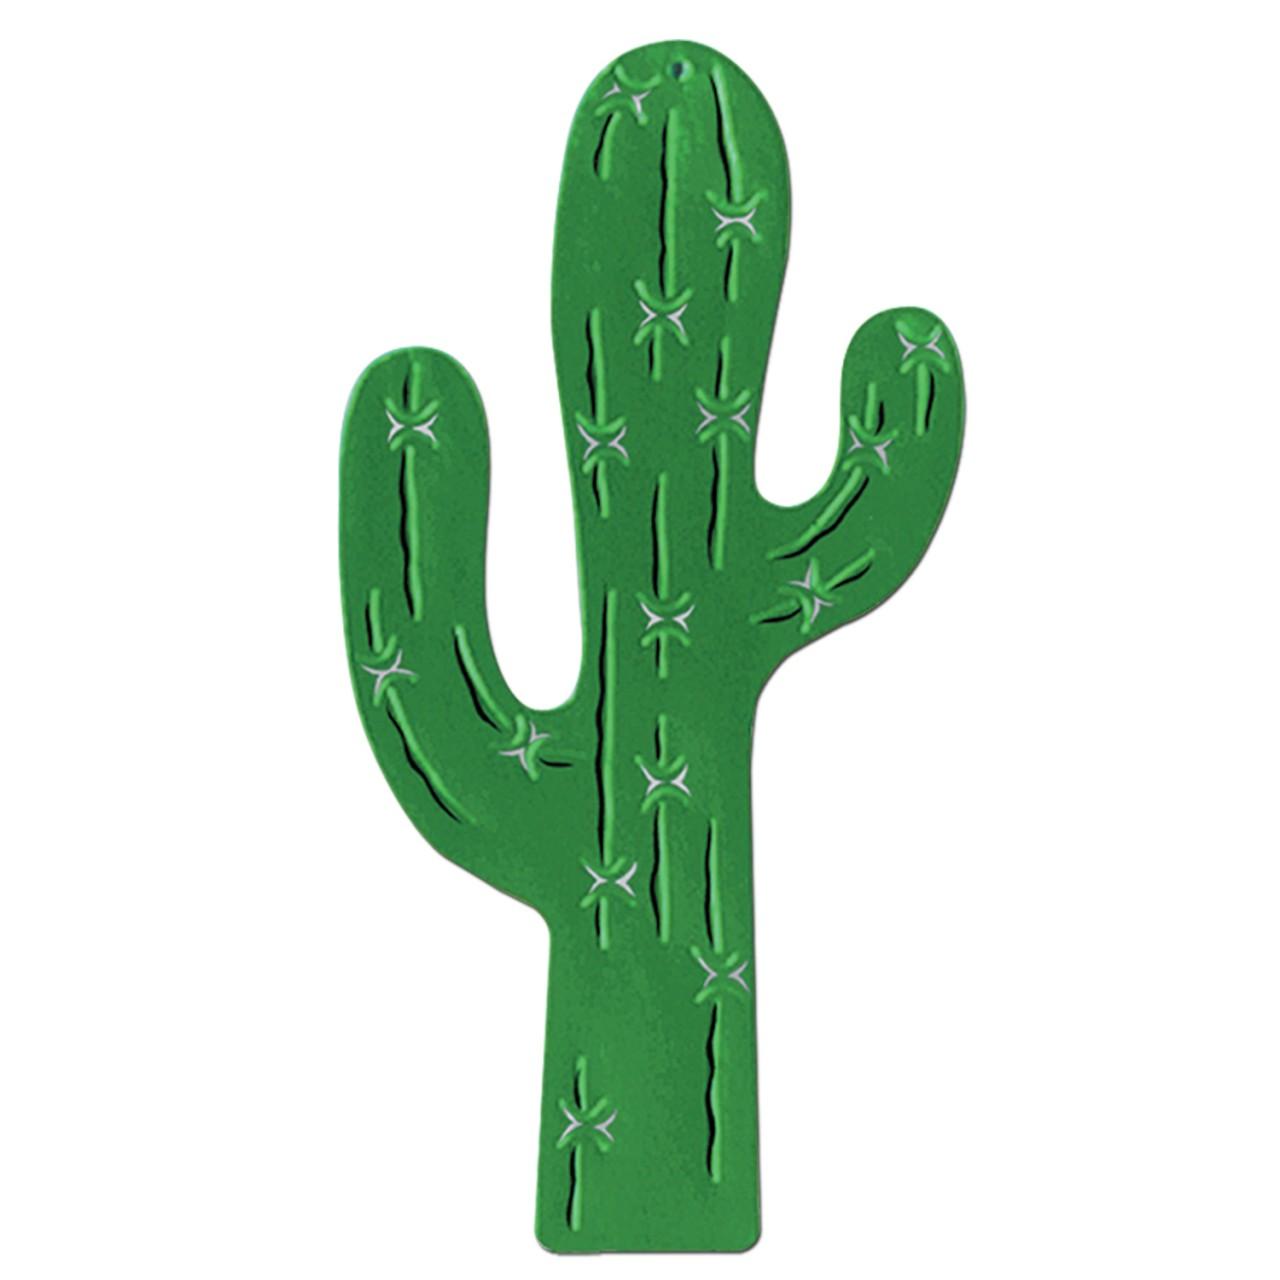 cactus-silhouette-clip-art-RgH6fY-clipart.jpg